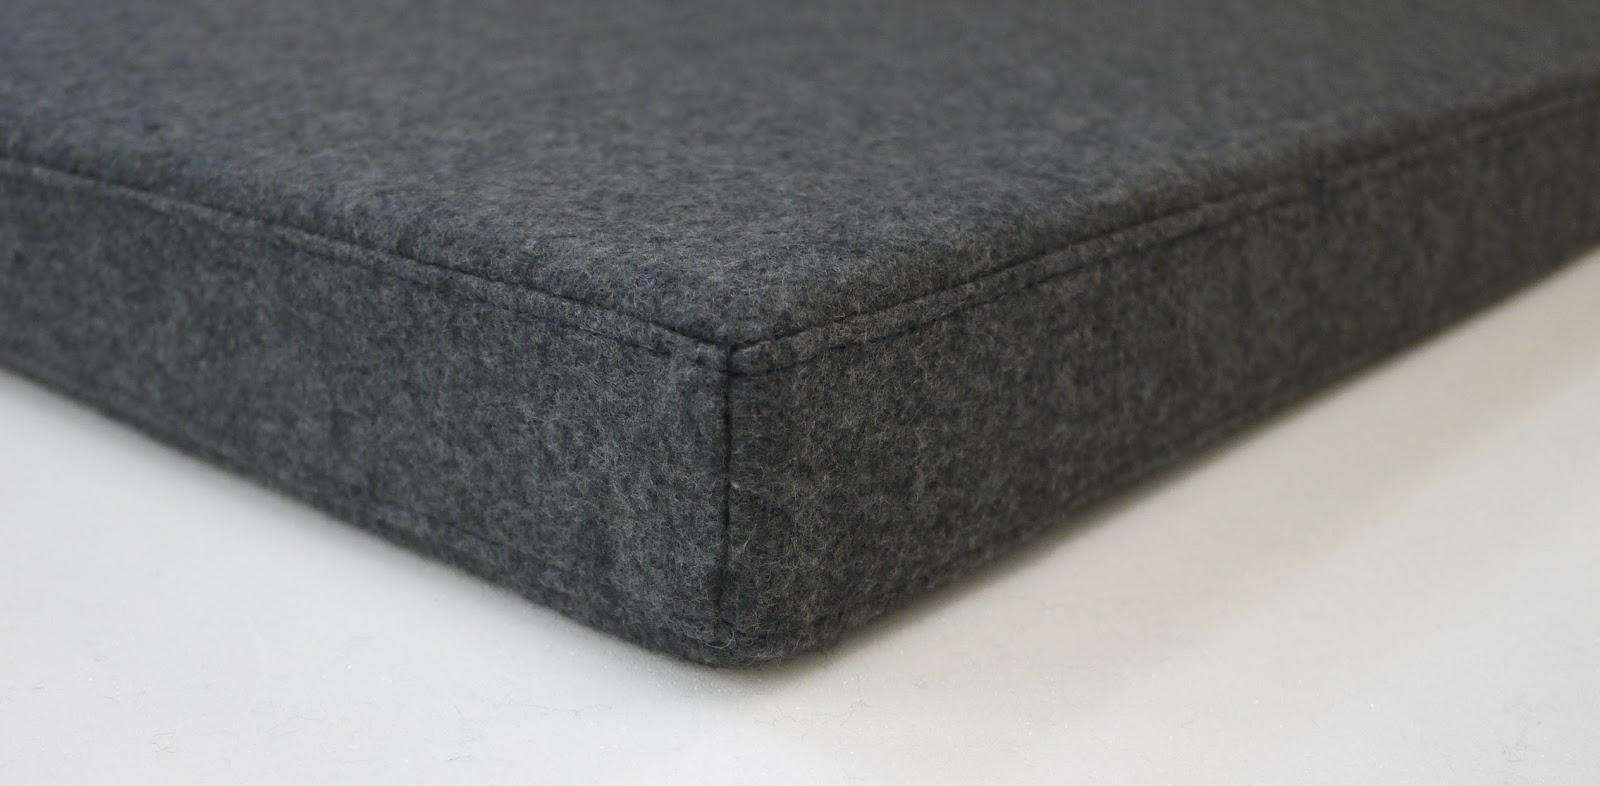 www.skumhuset.dk systue madrasser koldskum børnemadrasser puder skumgummi betræk